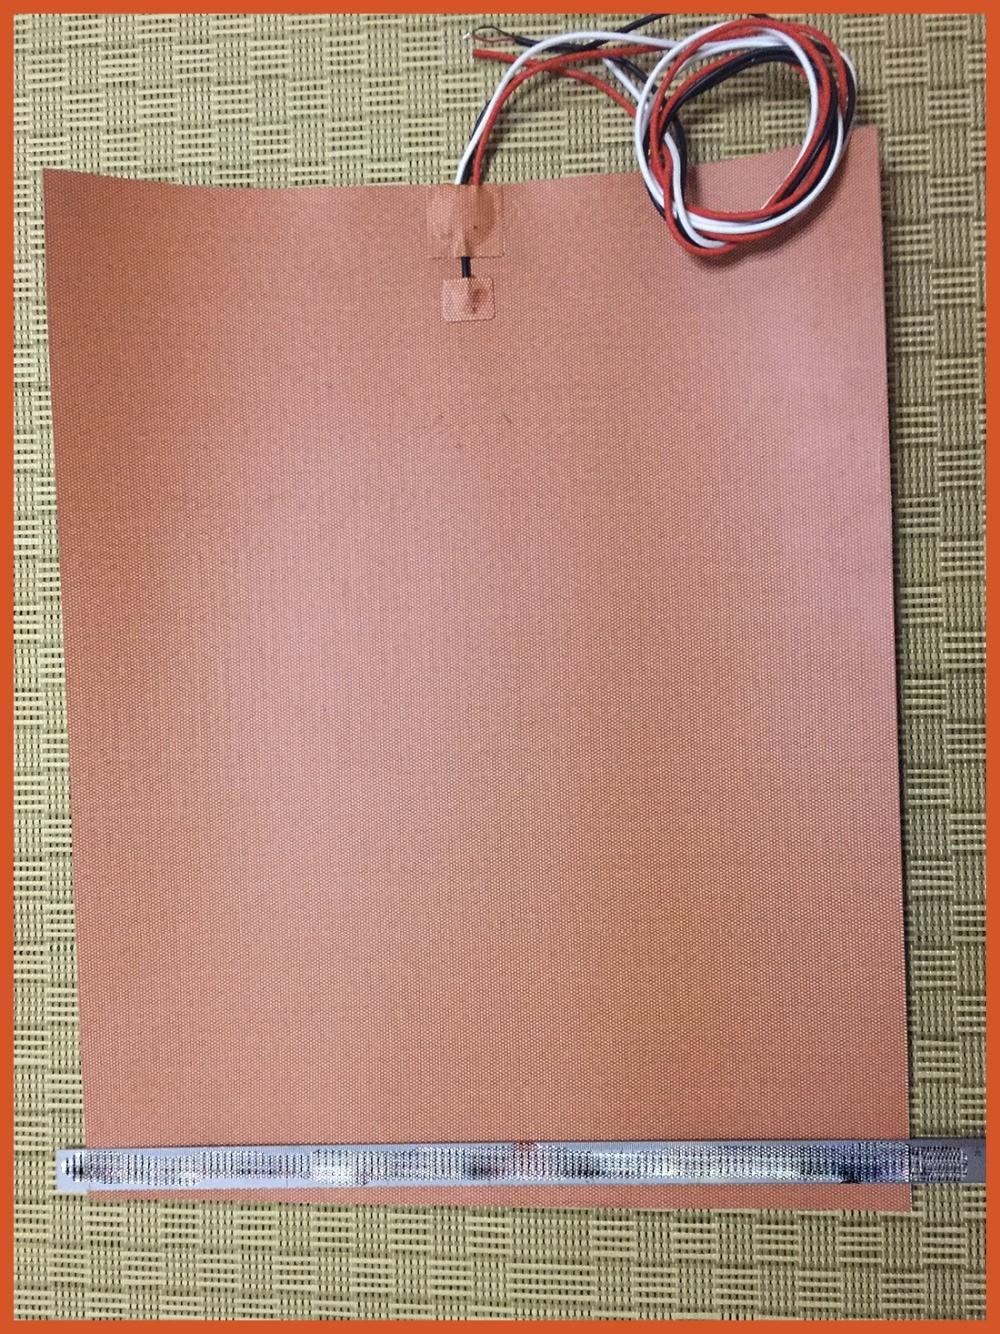 Gomma silicone riscaldatore per stampante 3d 110v 1500w 300*500MM 3m adhesive built-in termistore 100K element heater electric 12v dia170mm elettrico elemento riscaldante per stampante 3d silicone heating pad flexible heating element printer 3m adhesive